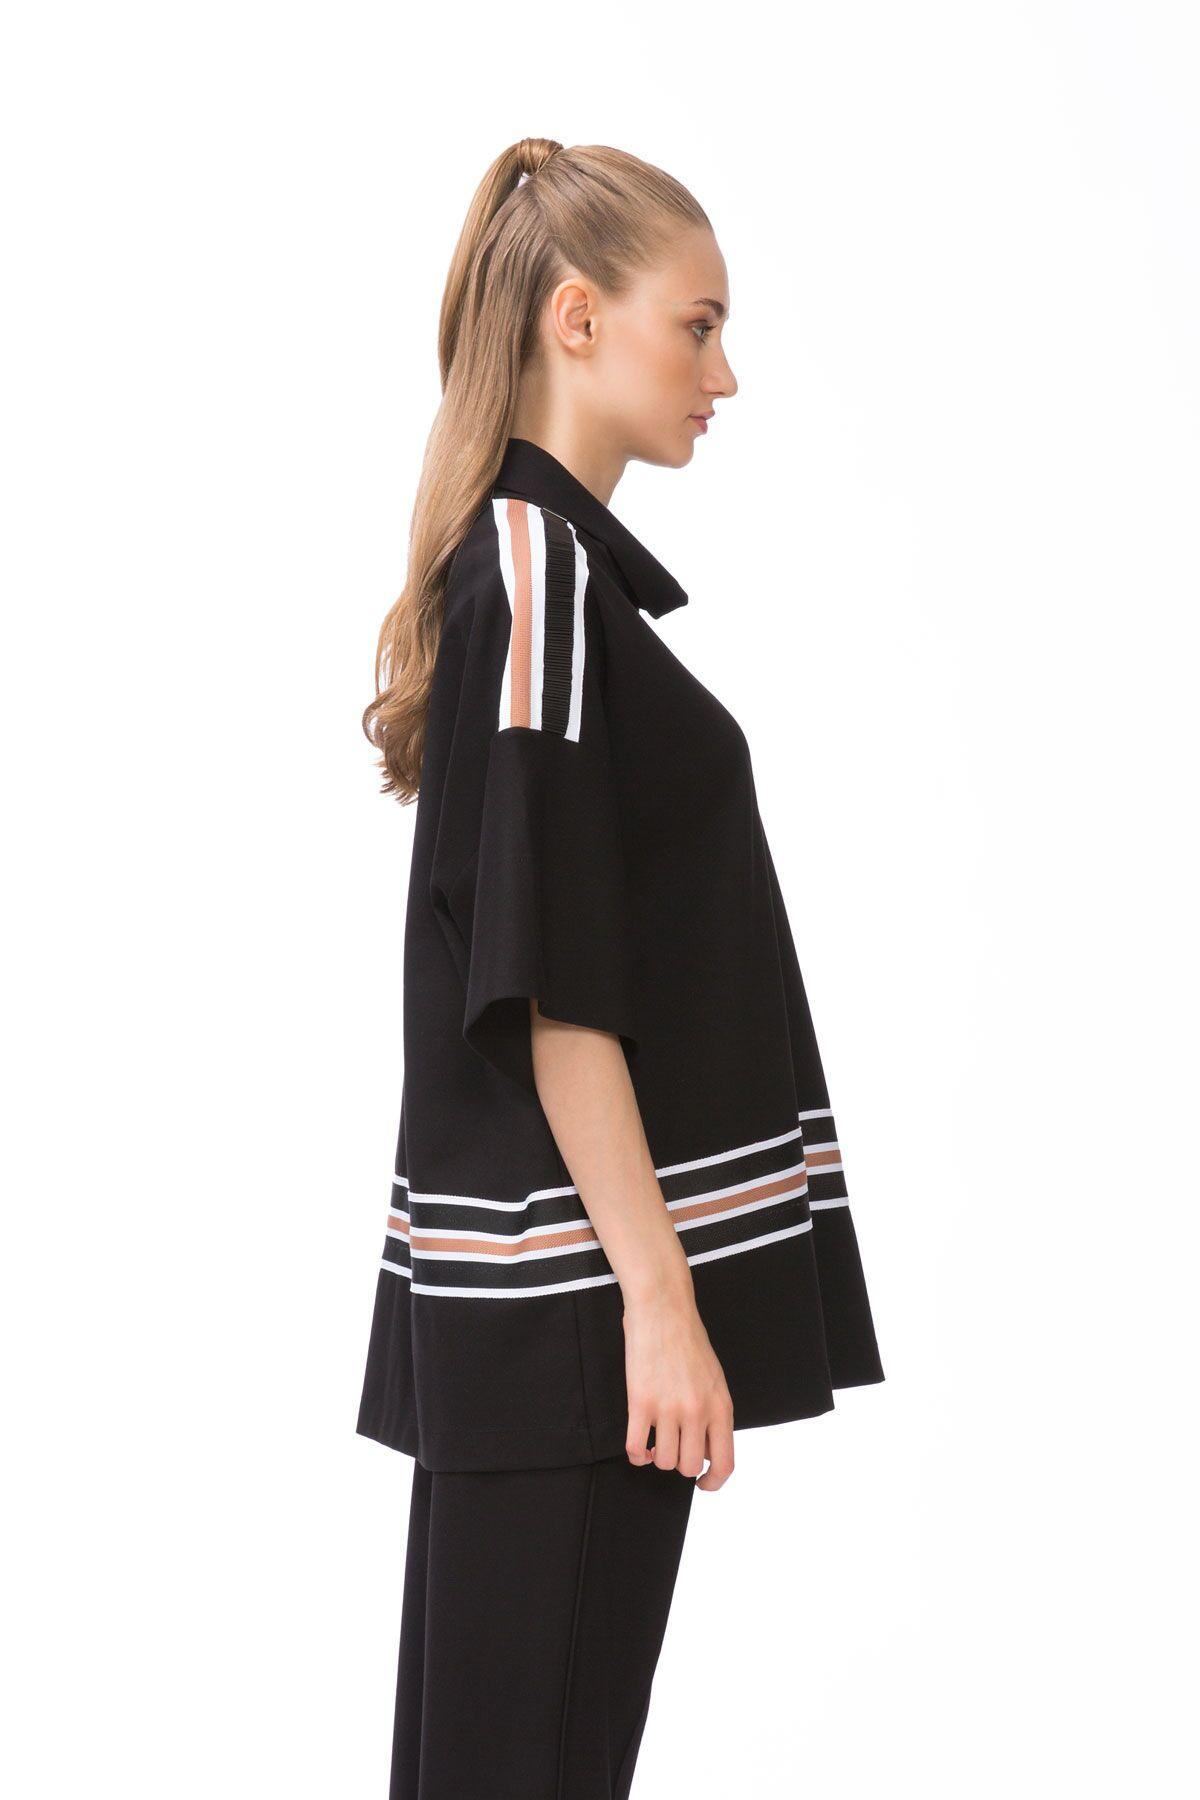 Stripe Detail Oversized Black Sport Top